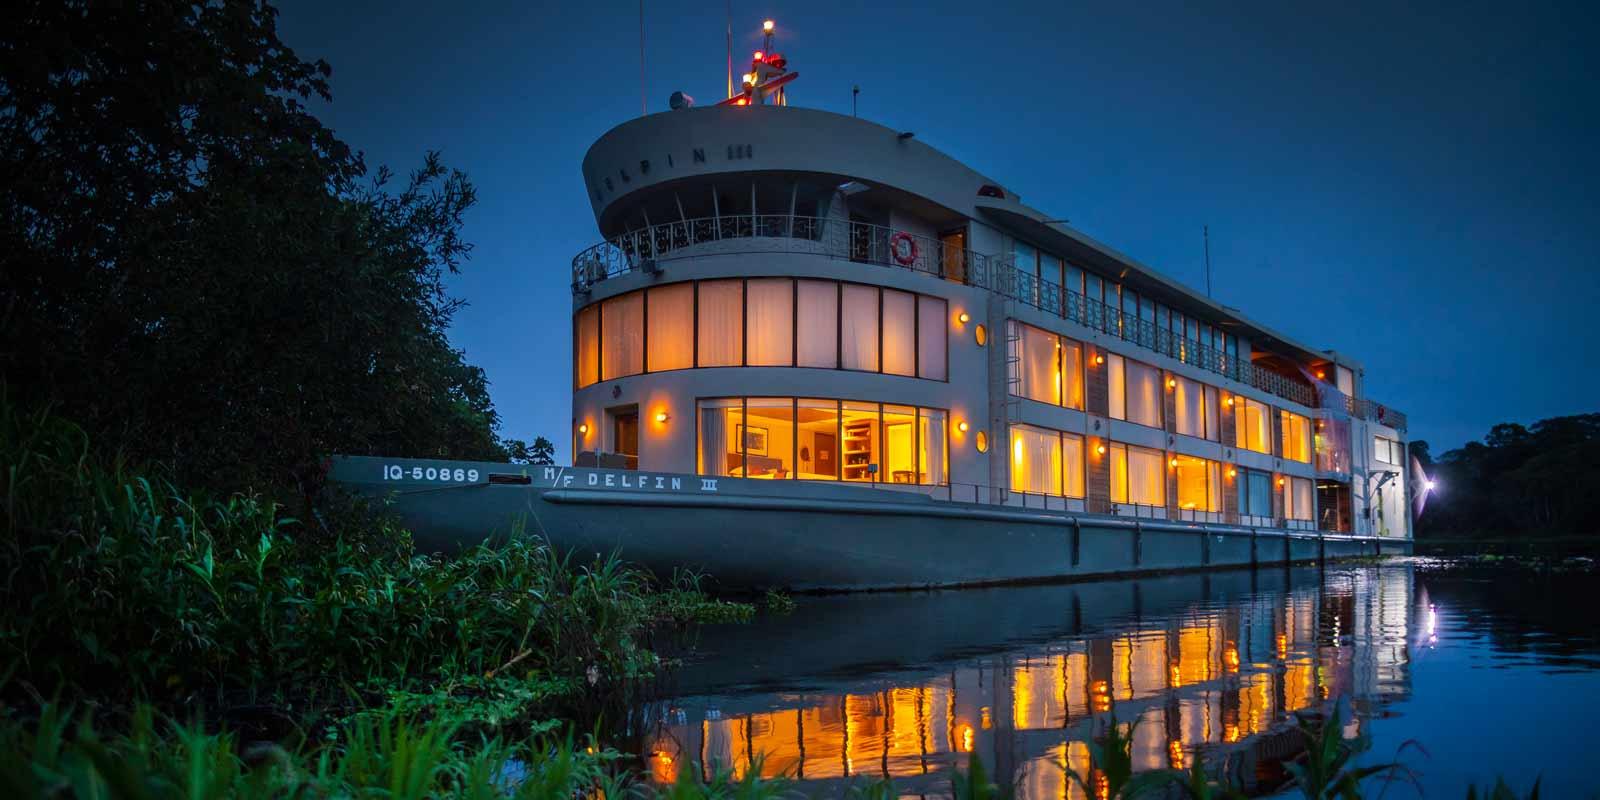 Luxury River Cruise | Delfin Amazon Cruises